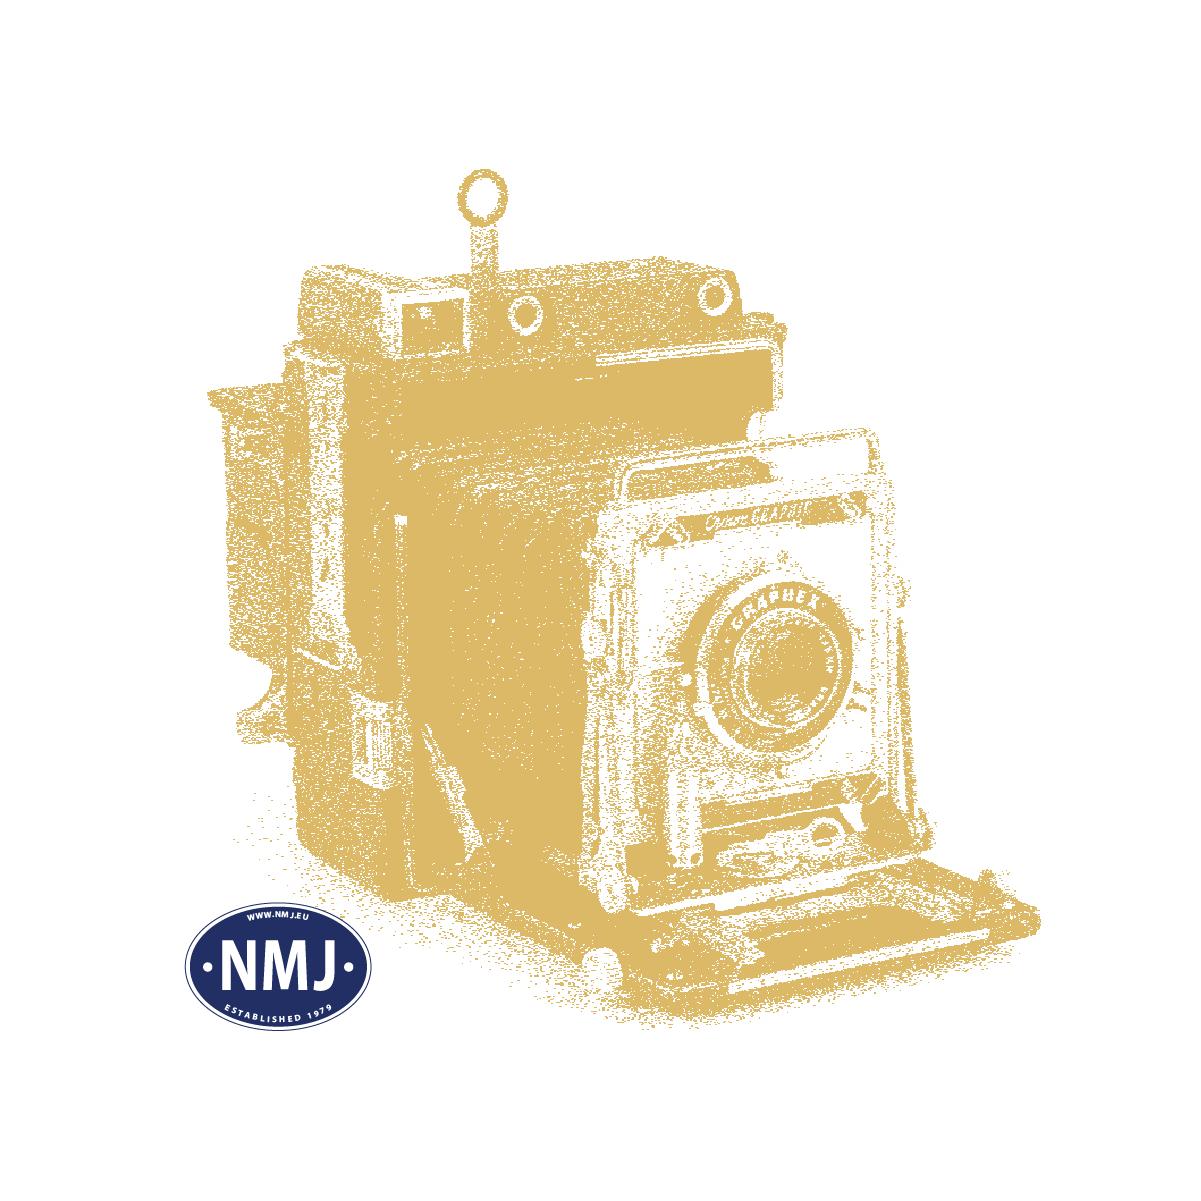 NMJT245302 - NMJ Topline CFL 1603,Orignal Ausgabe, 0-Skala, 1:45, DCC Sound